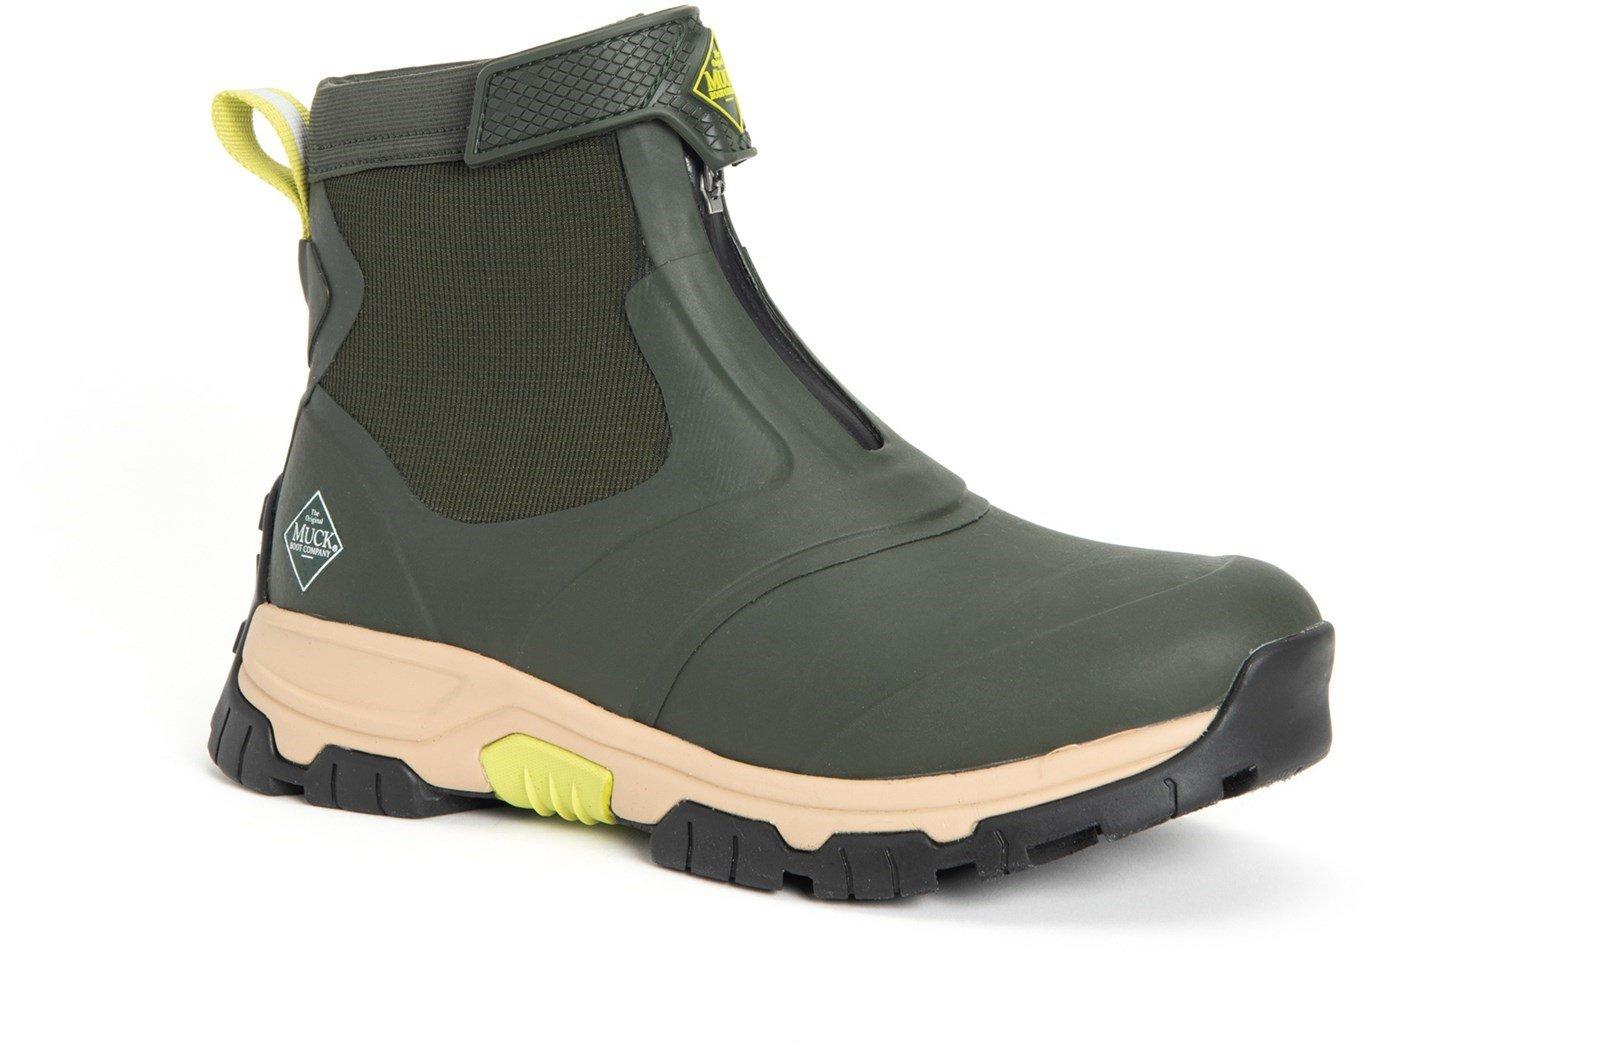 Muck Boots Unisex Apex Mid Zip Boot Various Colours 30981 - Moss/Tan Midsole 6